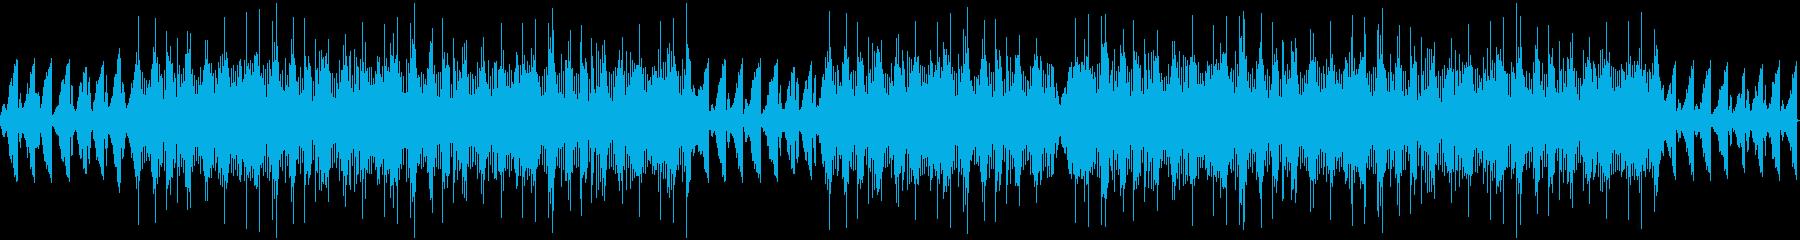 Chaos Trap Beatの再生済みの波形